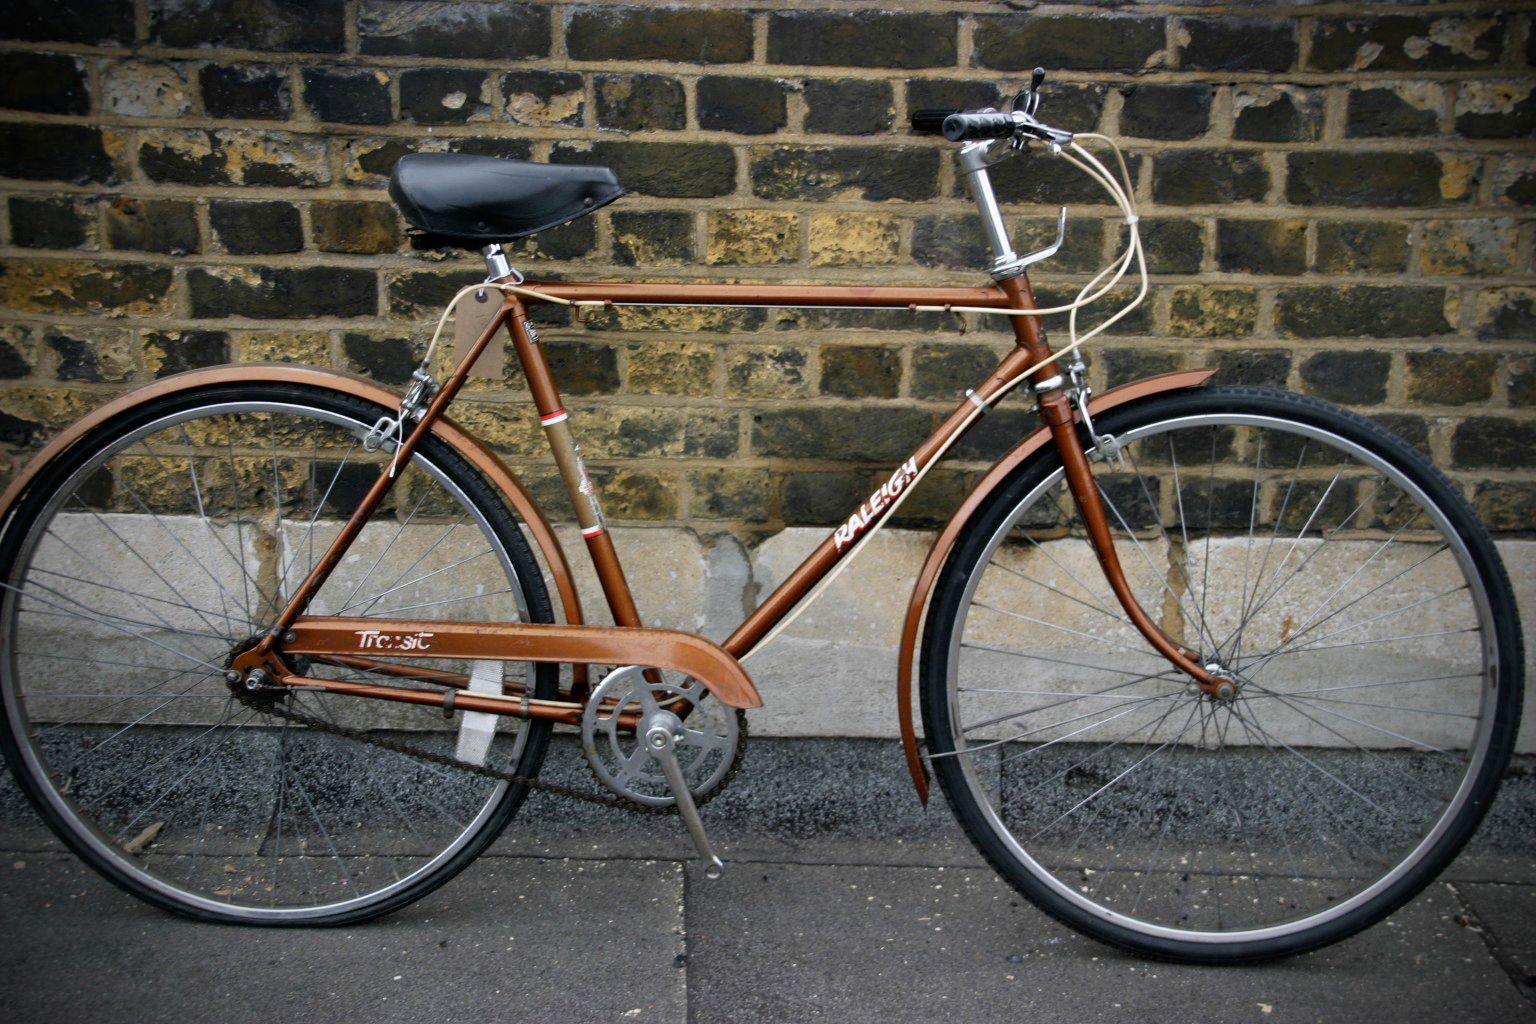 raleigh bike dating vietnam dating sites free